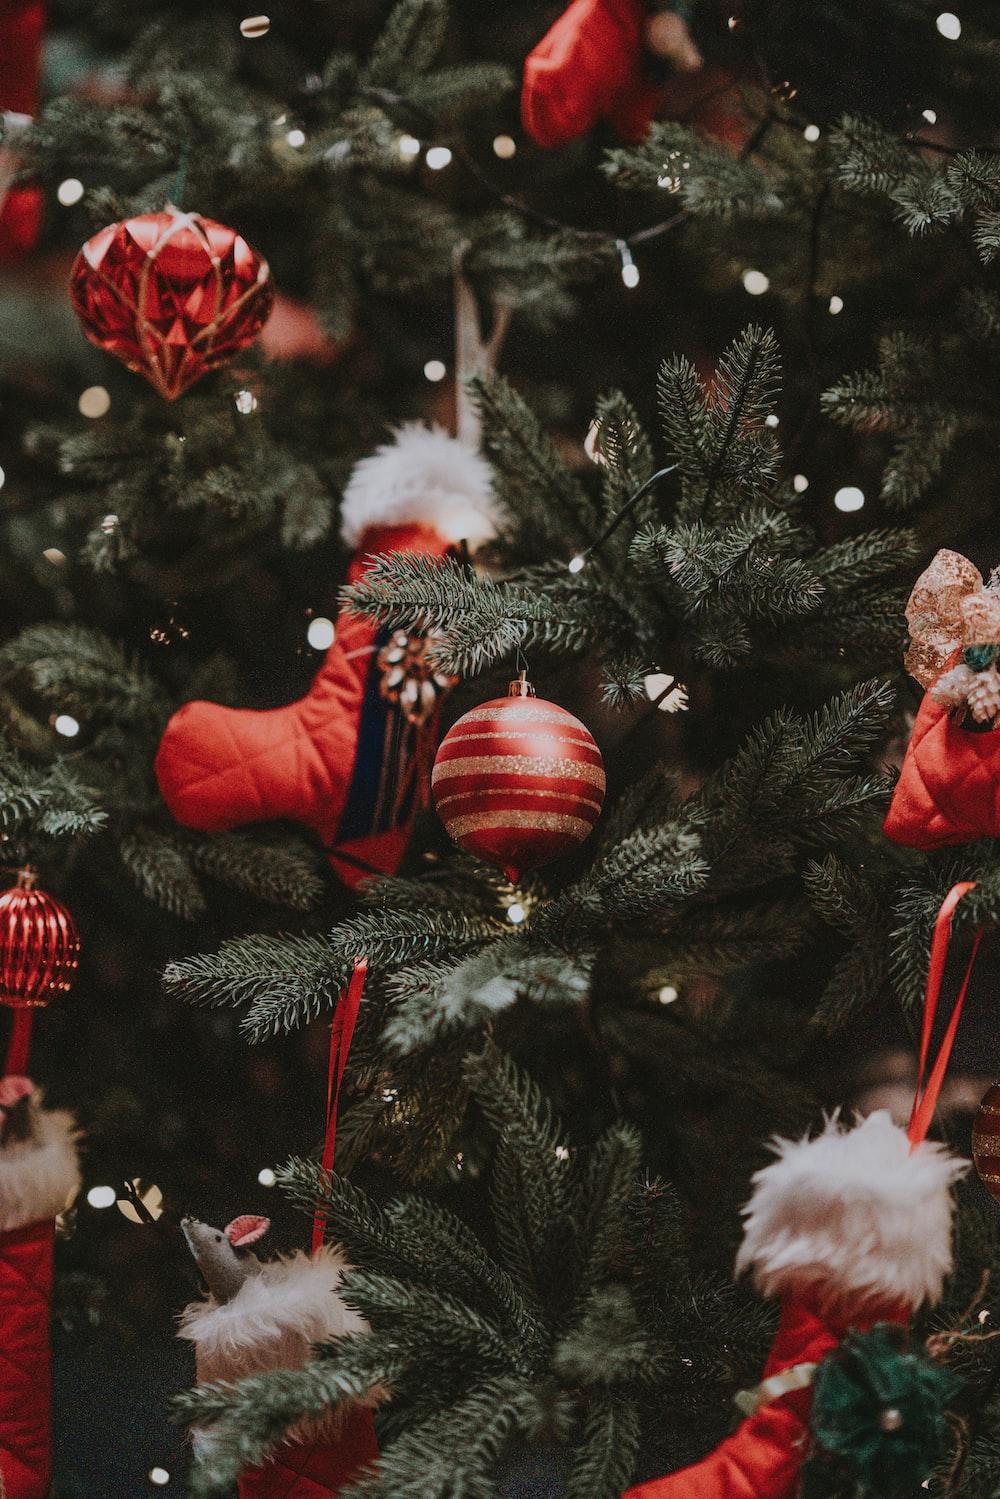 Christmas tree with decor lot